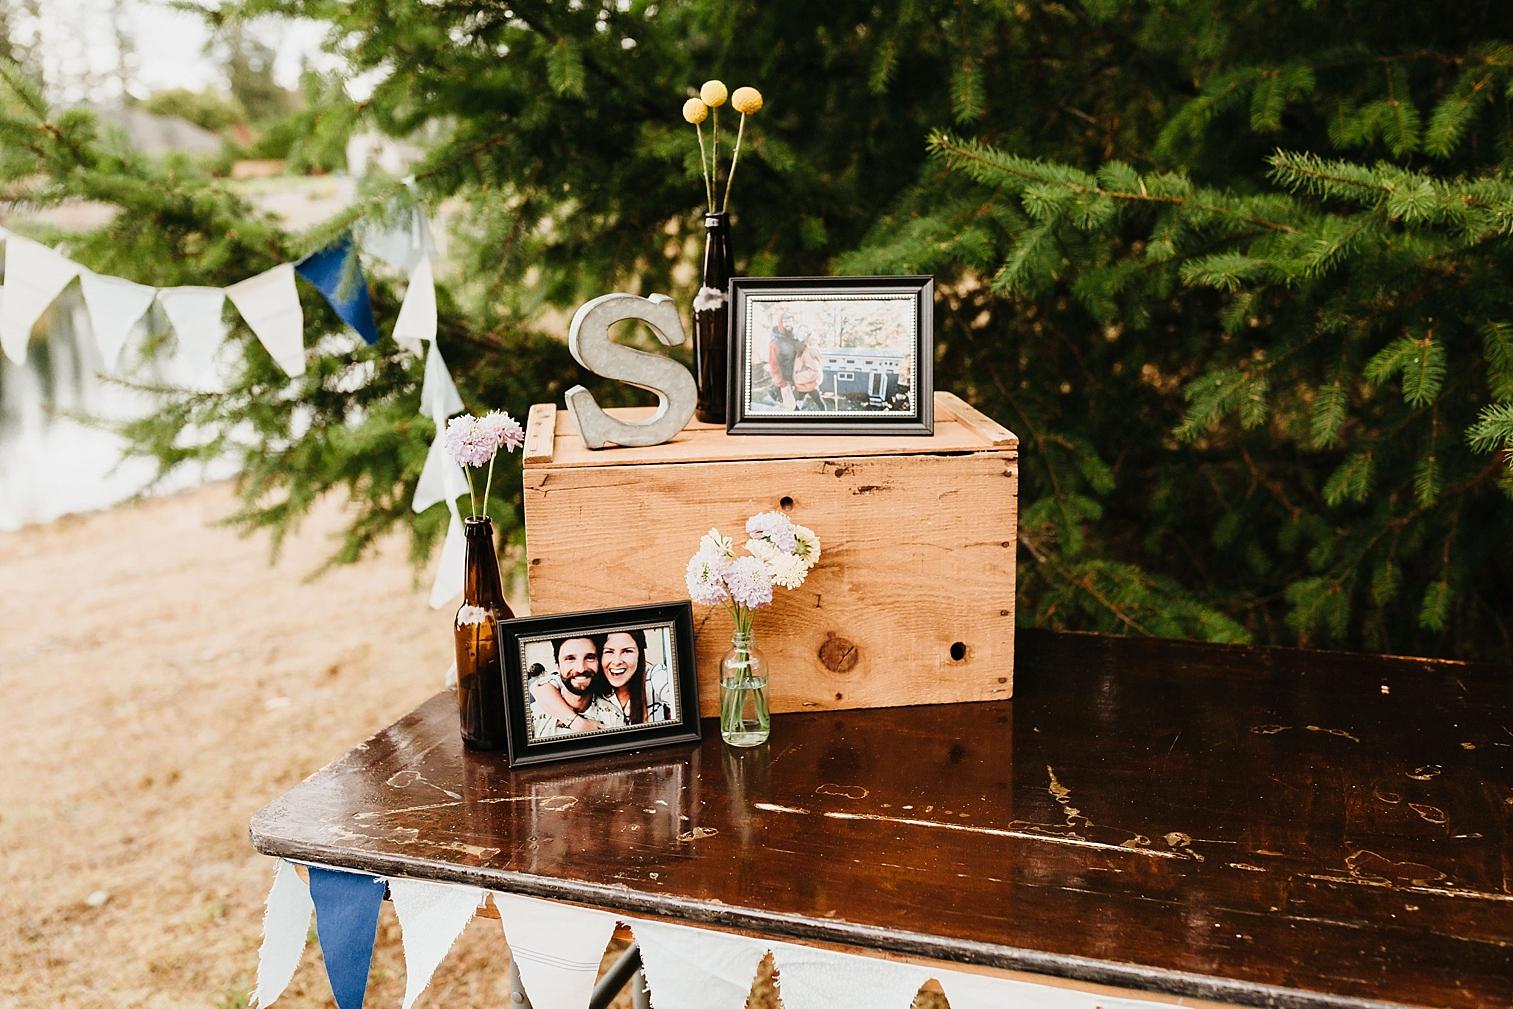 Summer-Camp-Themed-Wedding-73.jpg